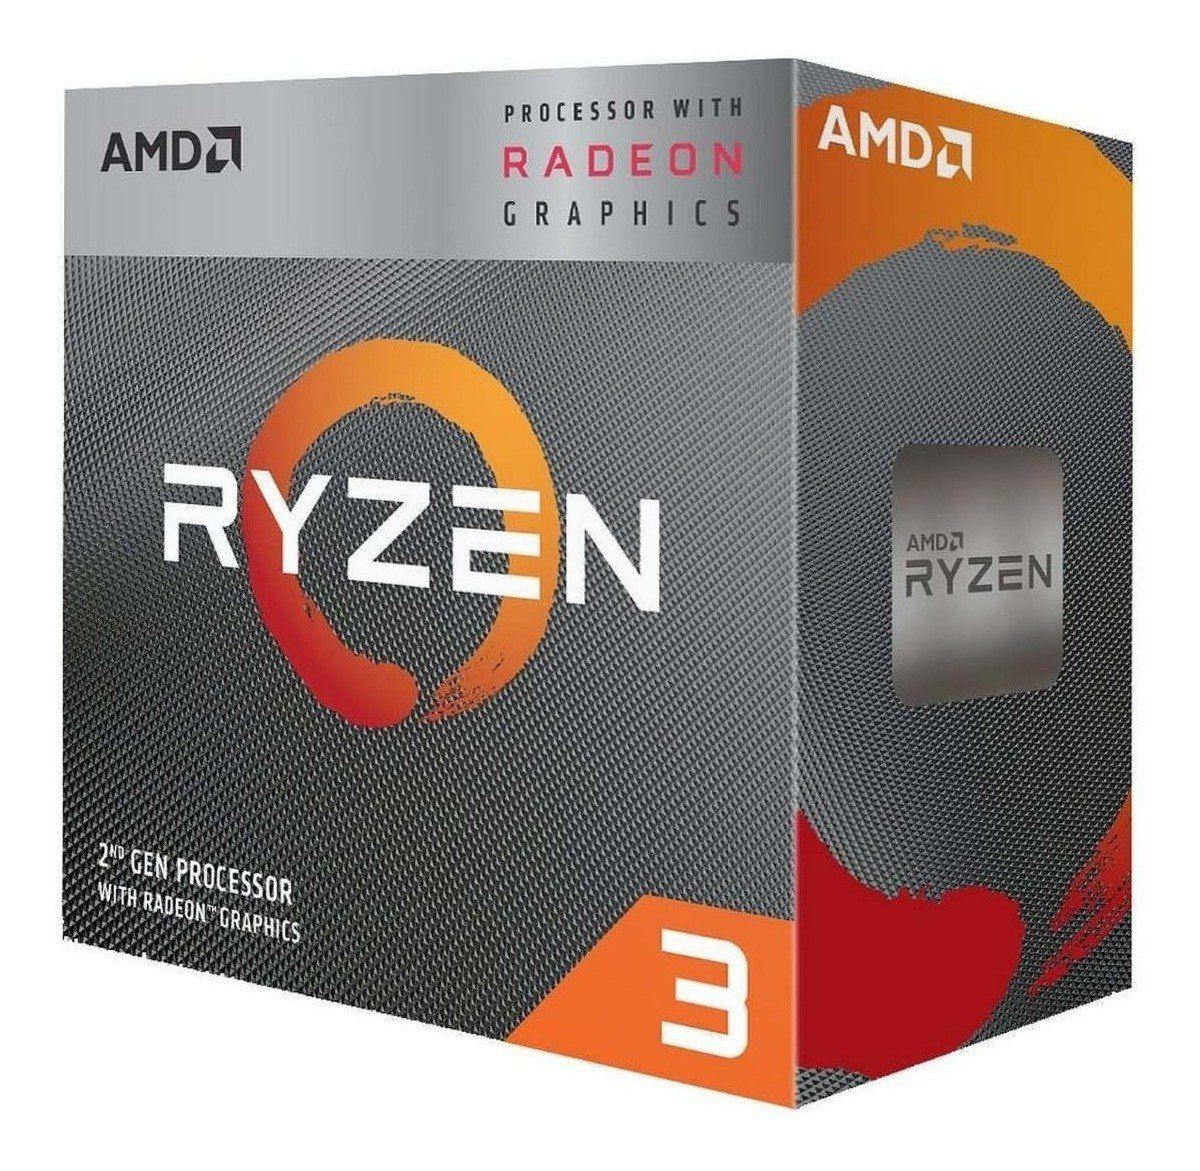 procesador-amd-ryzen-3-3200g-3-60ghz-4mb-l3-4-core-am4-14nm-65w